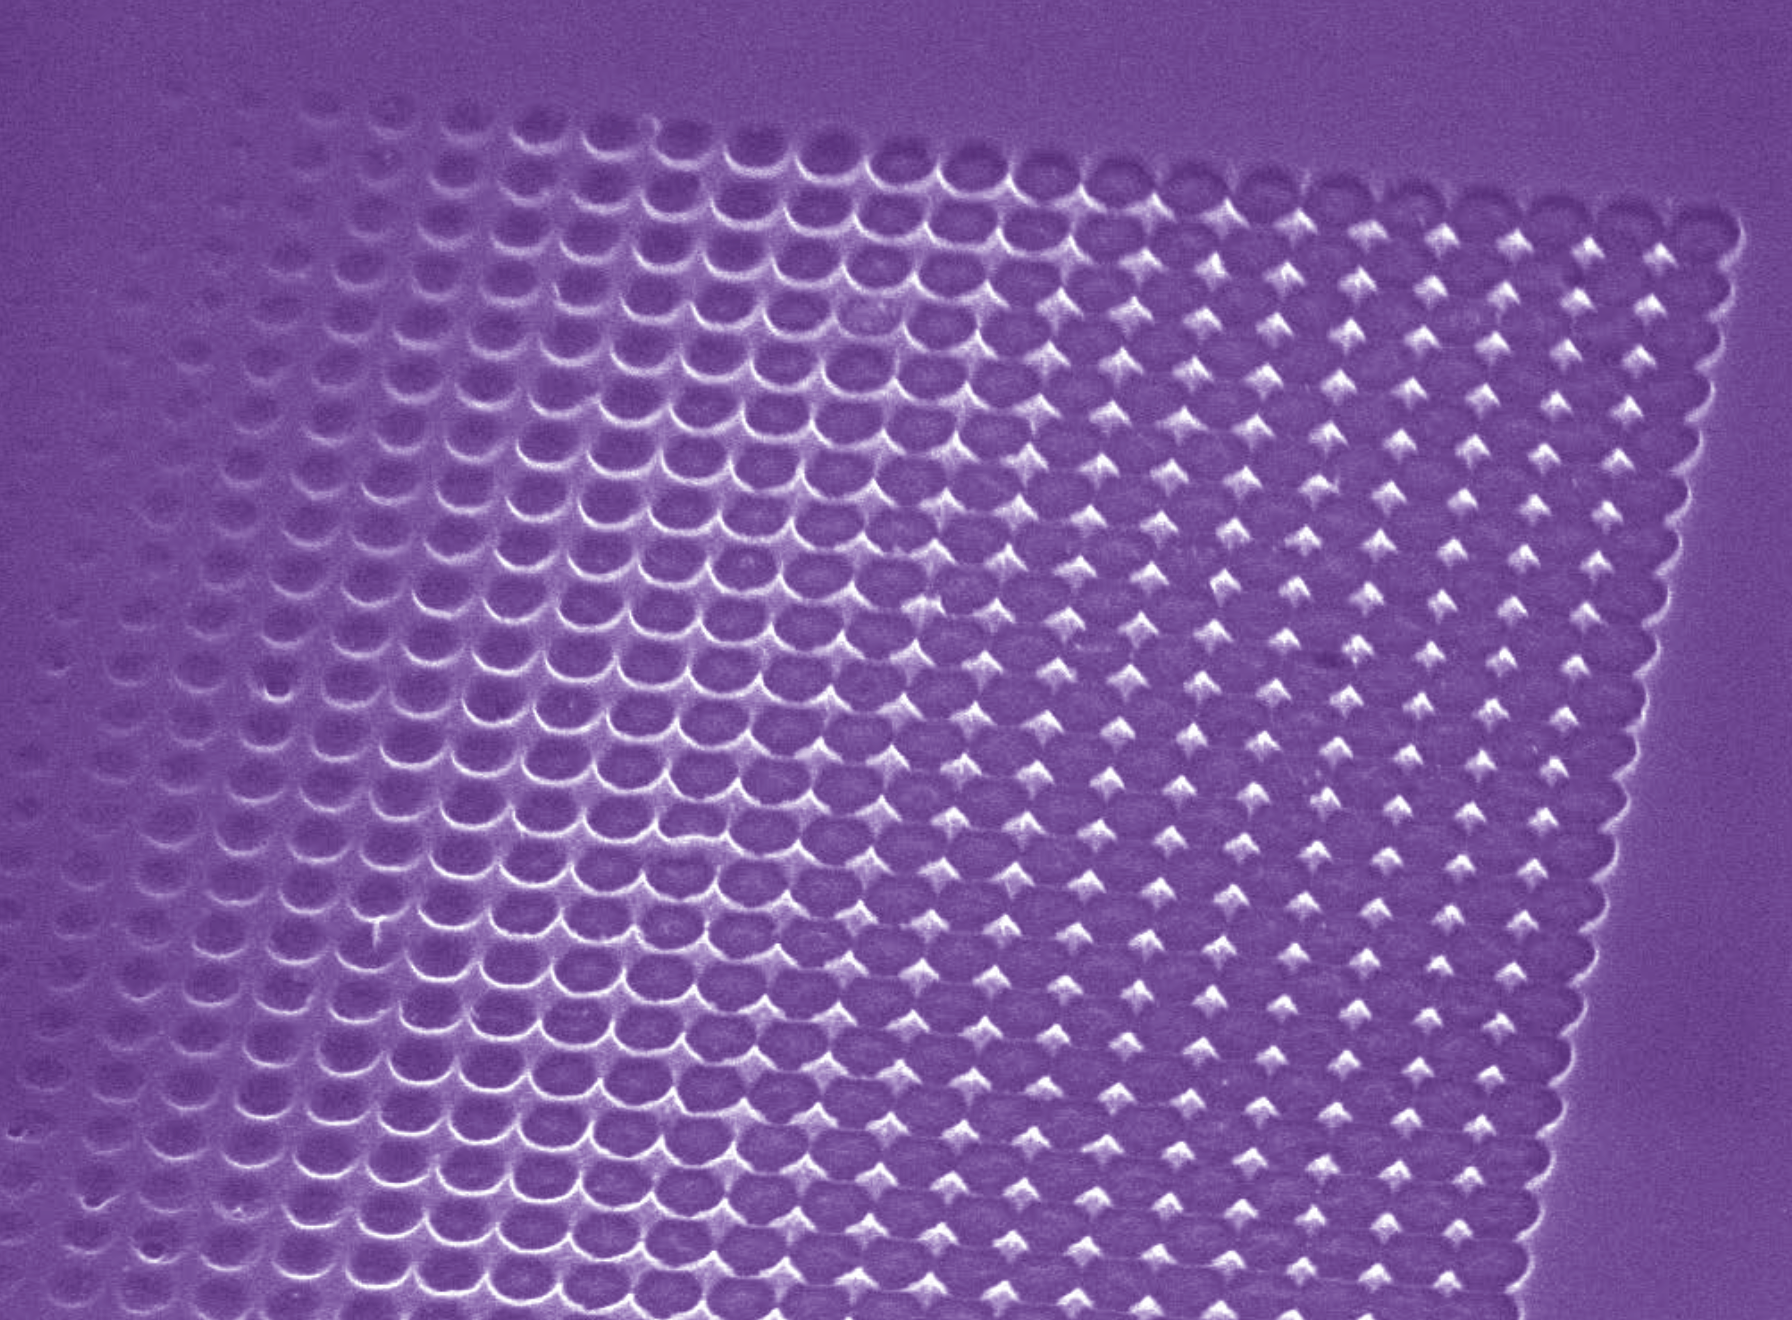 Pinching holes to create superconductors https://www.universiteitleiden.nl/en/news/2017/09/pinching-holes-to-create-superconductors